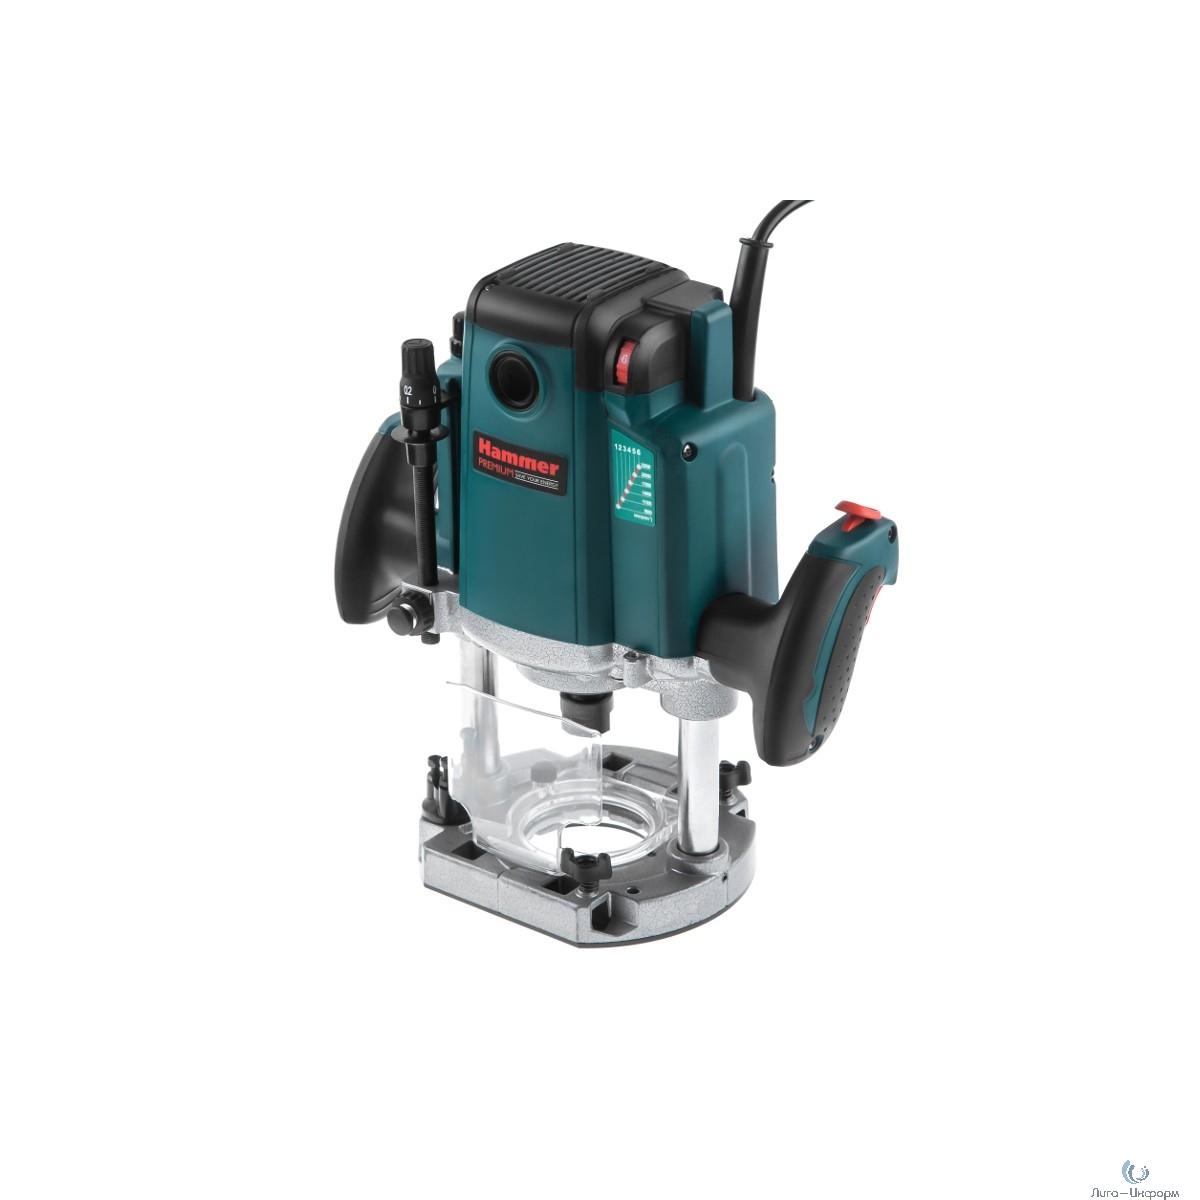 Hammer FRZ2200 Premium Фрезер [439353] { 2200Вт 9000-22000об/мин, 6-12мм, ход 75 мм }